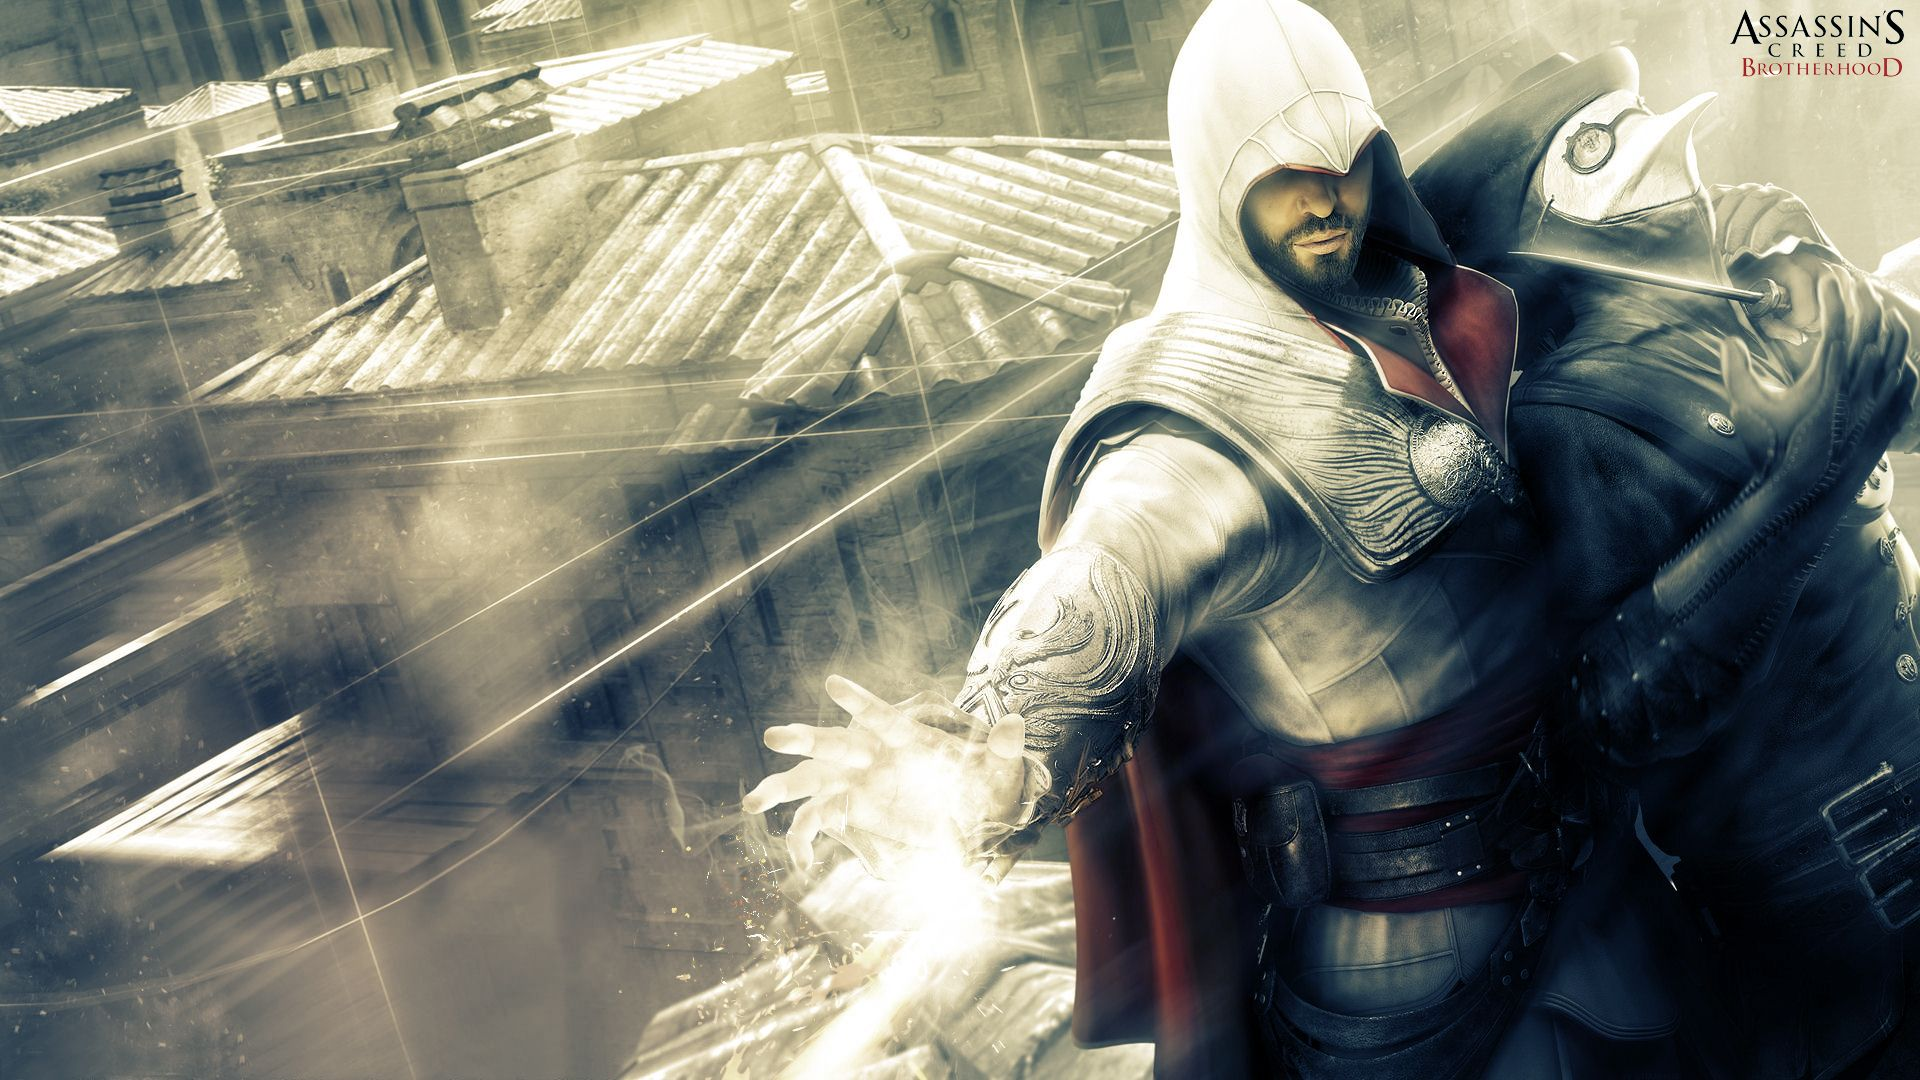 Assassins Creed Wallpaper 1920X1080 wallpaper   610654 1920x1080